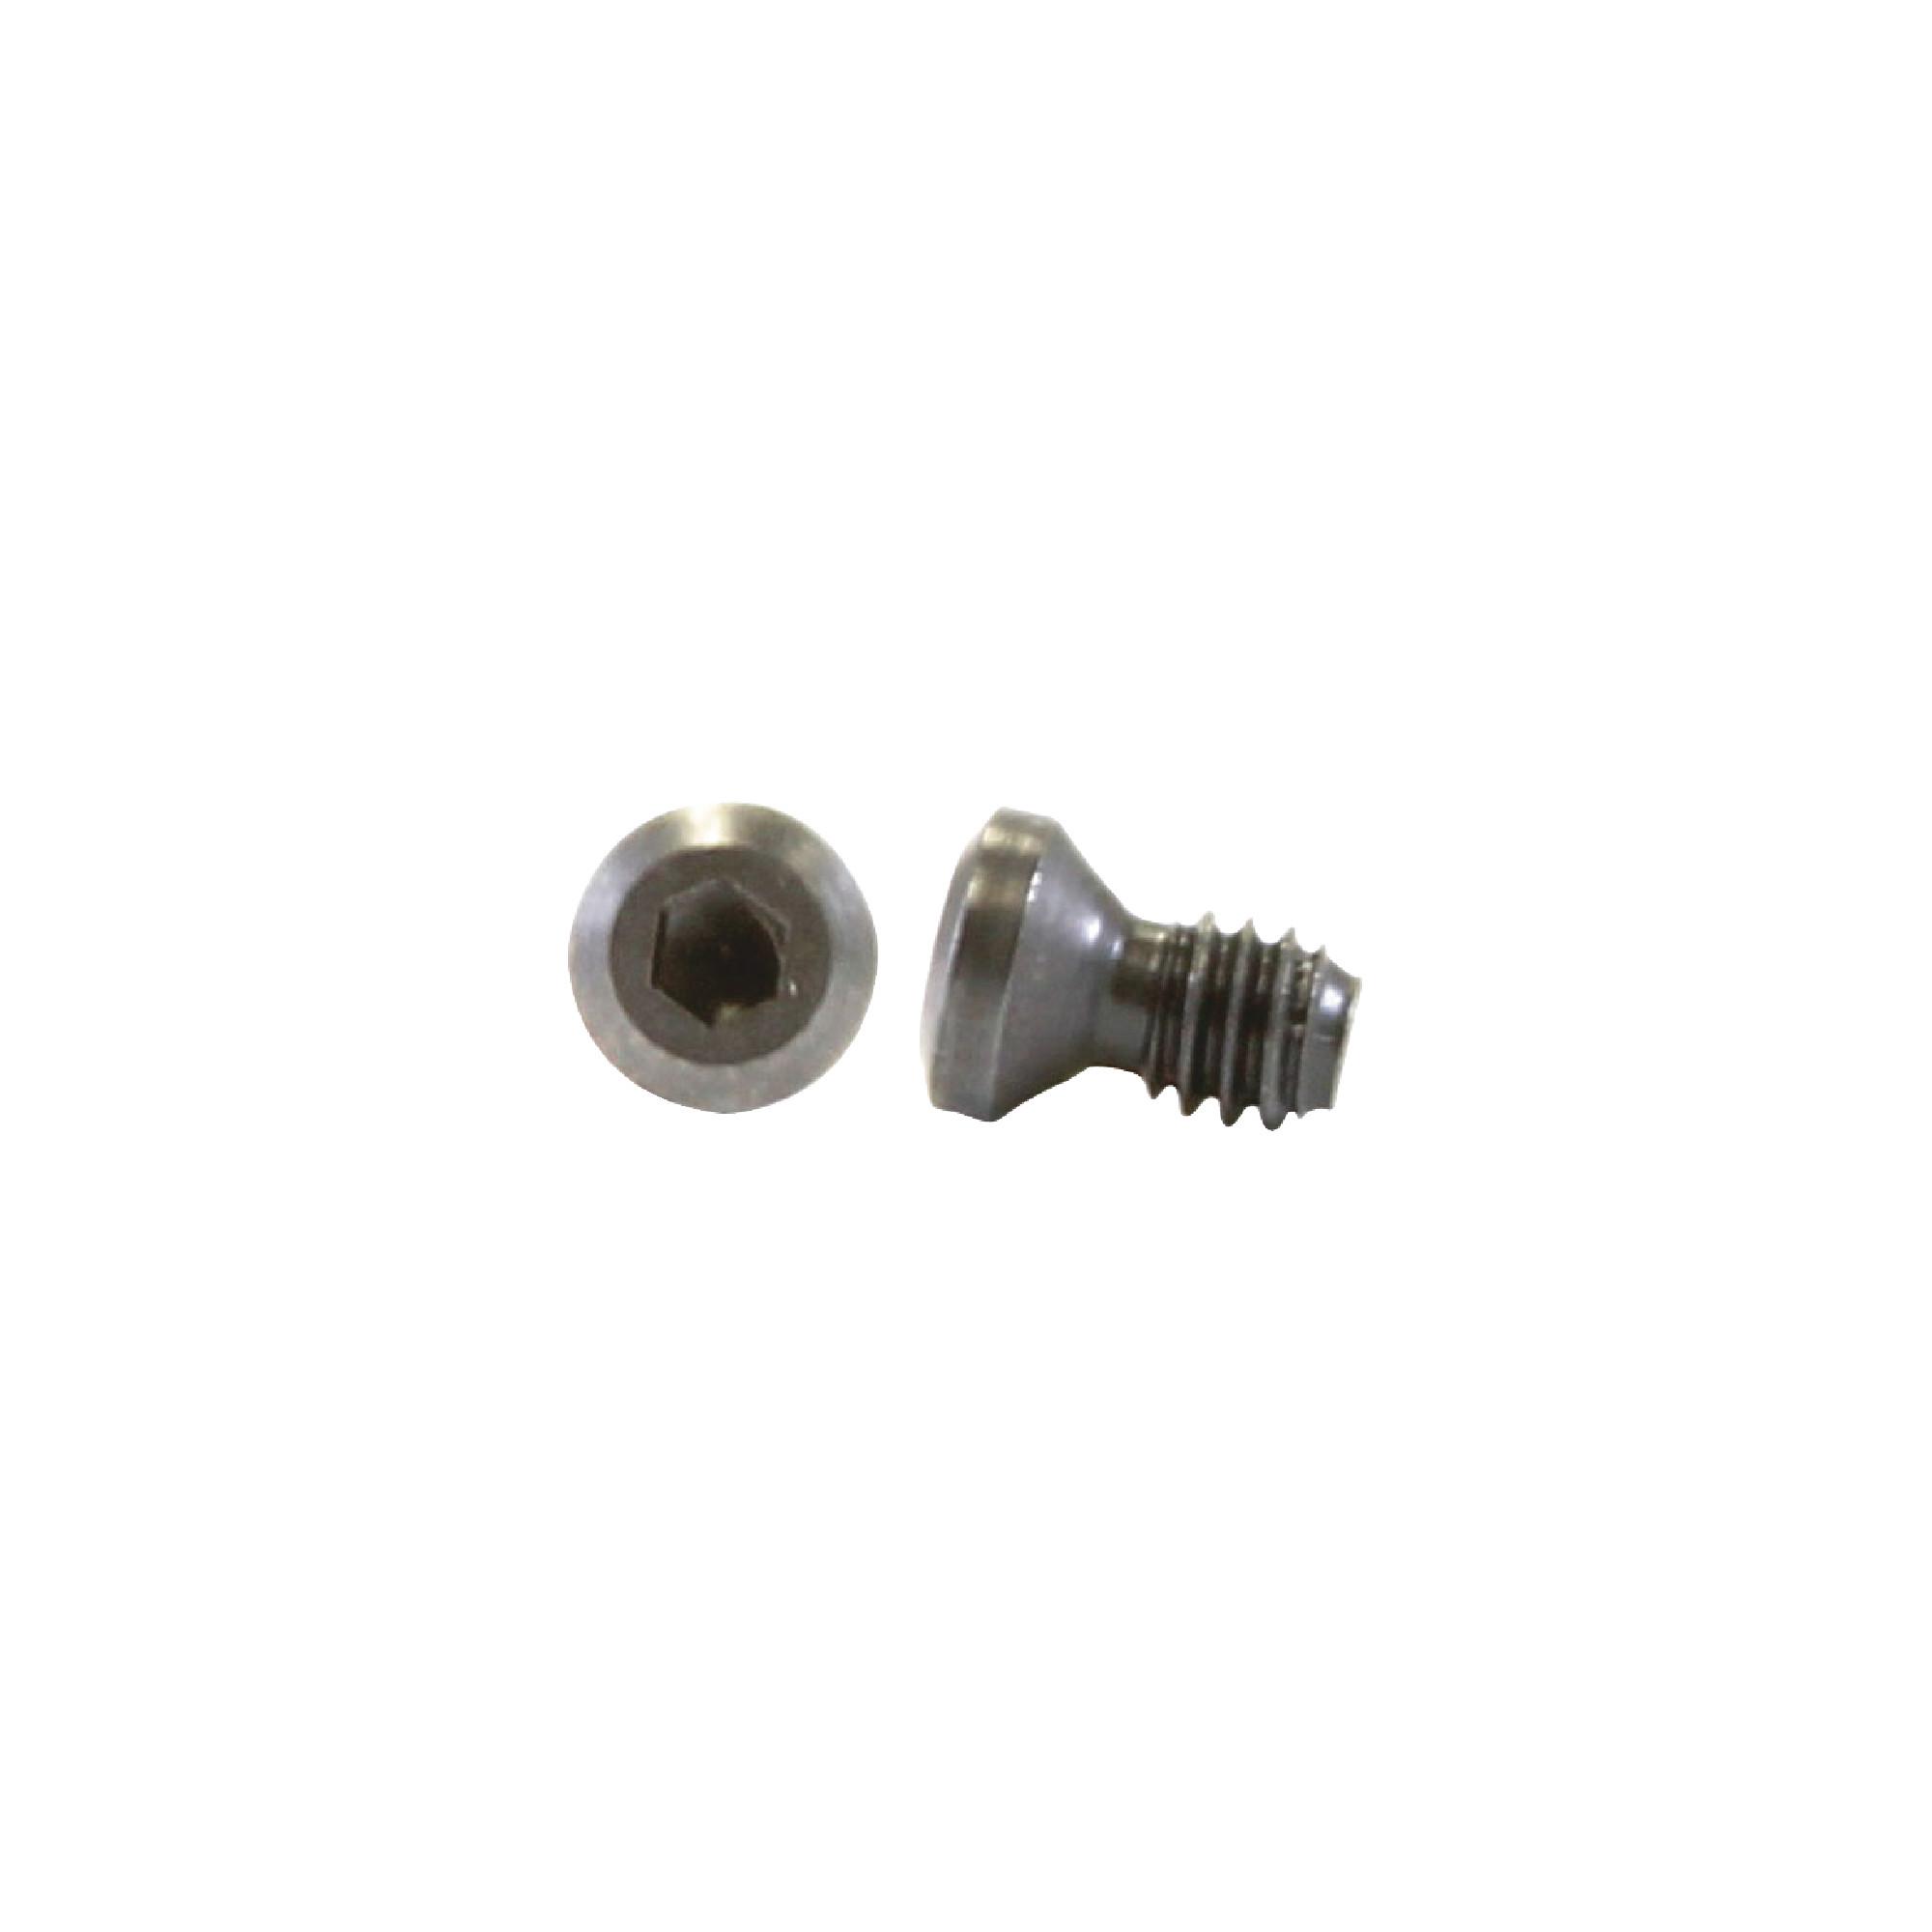 AB TOOLS - 3.5mm-SH Torx® Screw